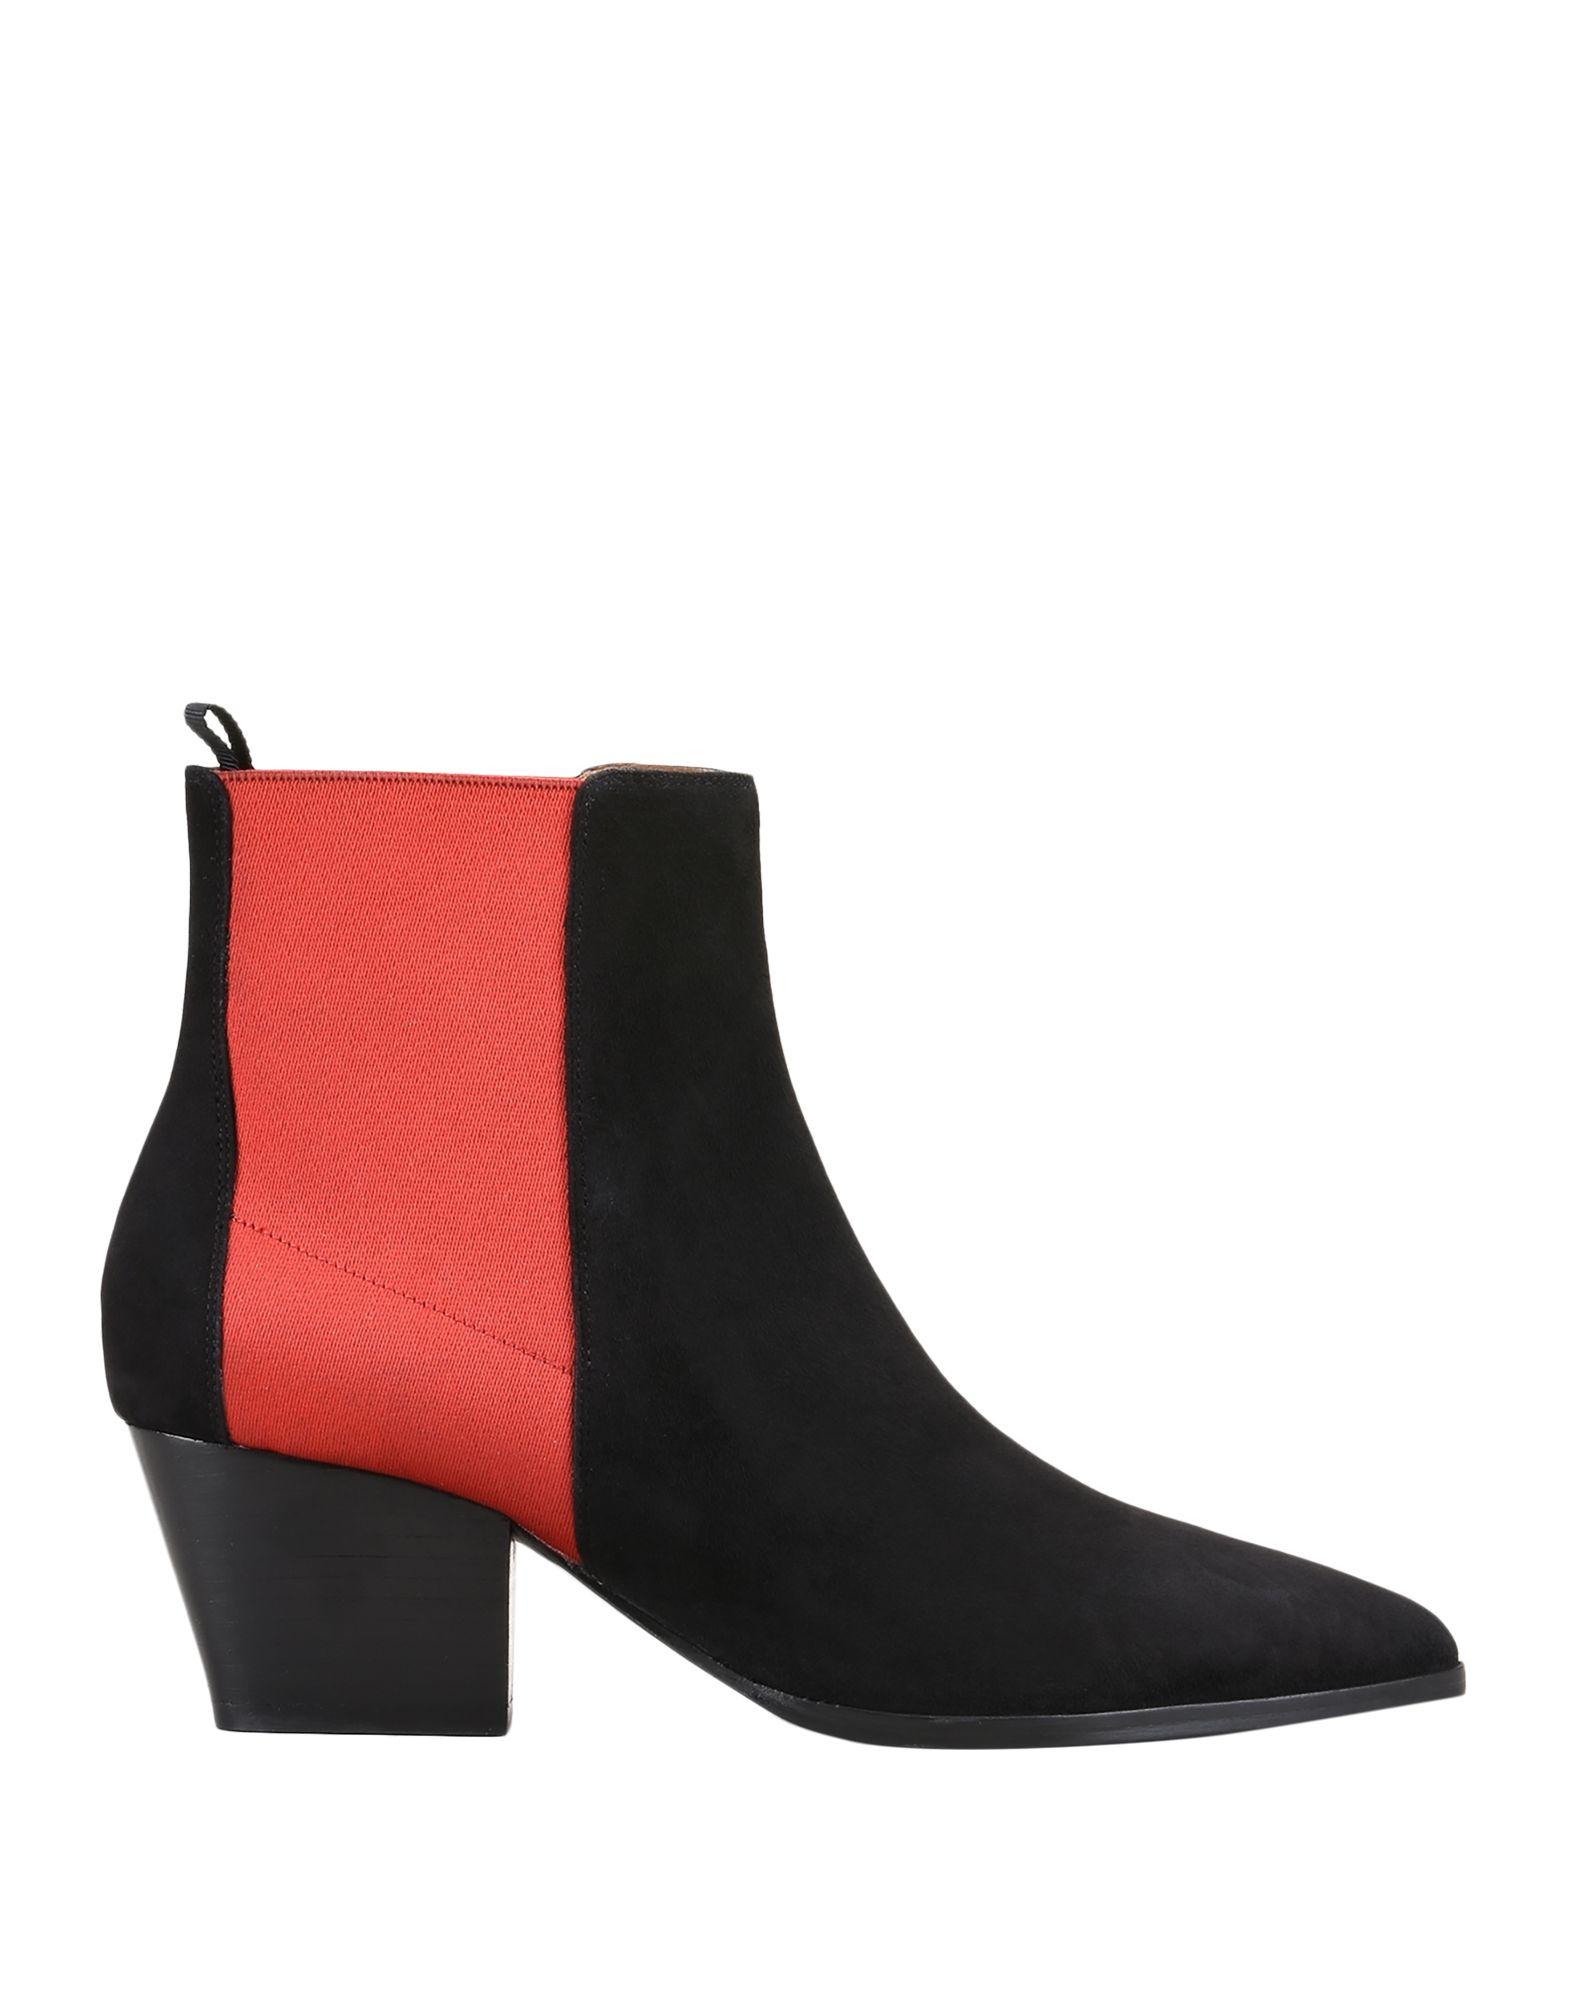 EMPORIO ARMANI Полусапоги и высокие ботинки armani exchange полусапоги и высокие ботинки